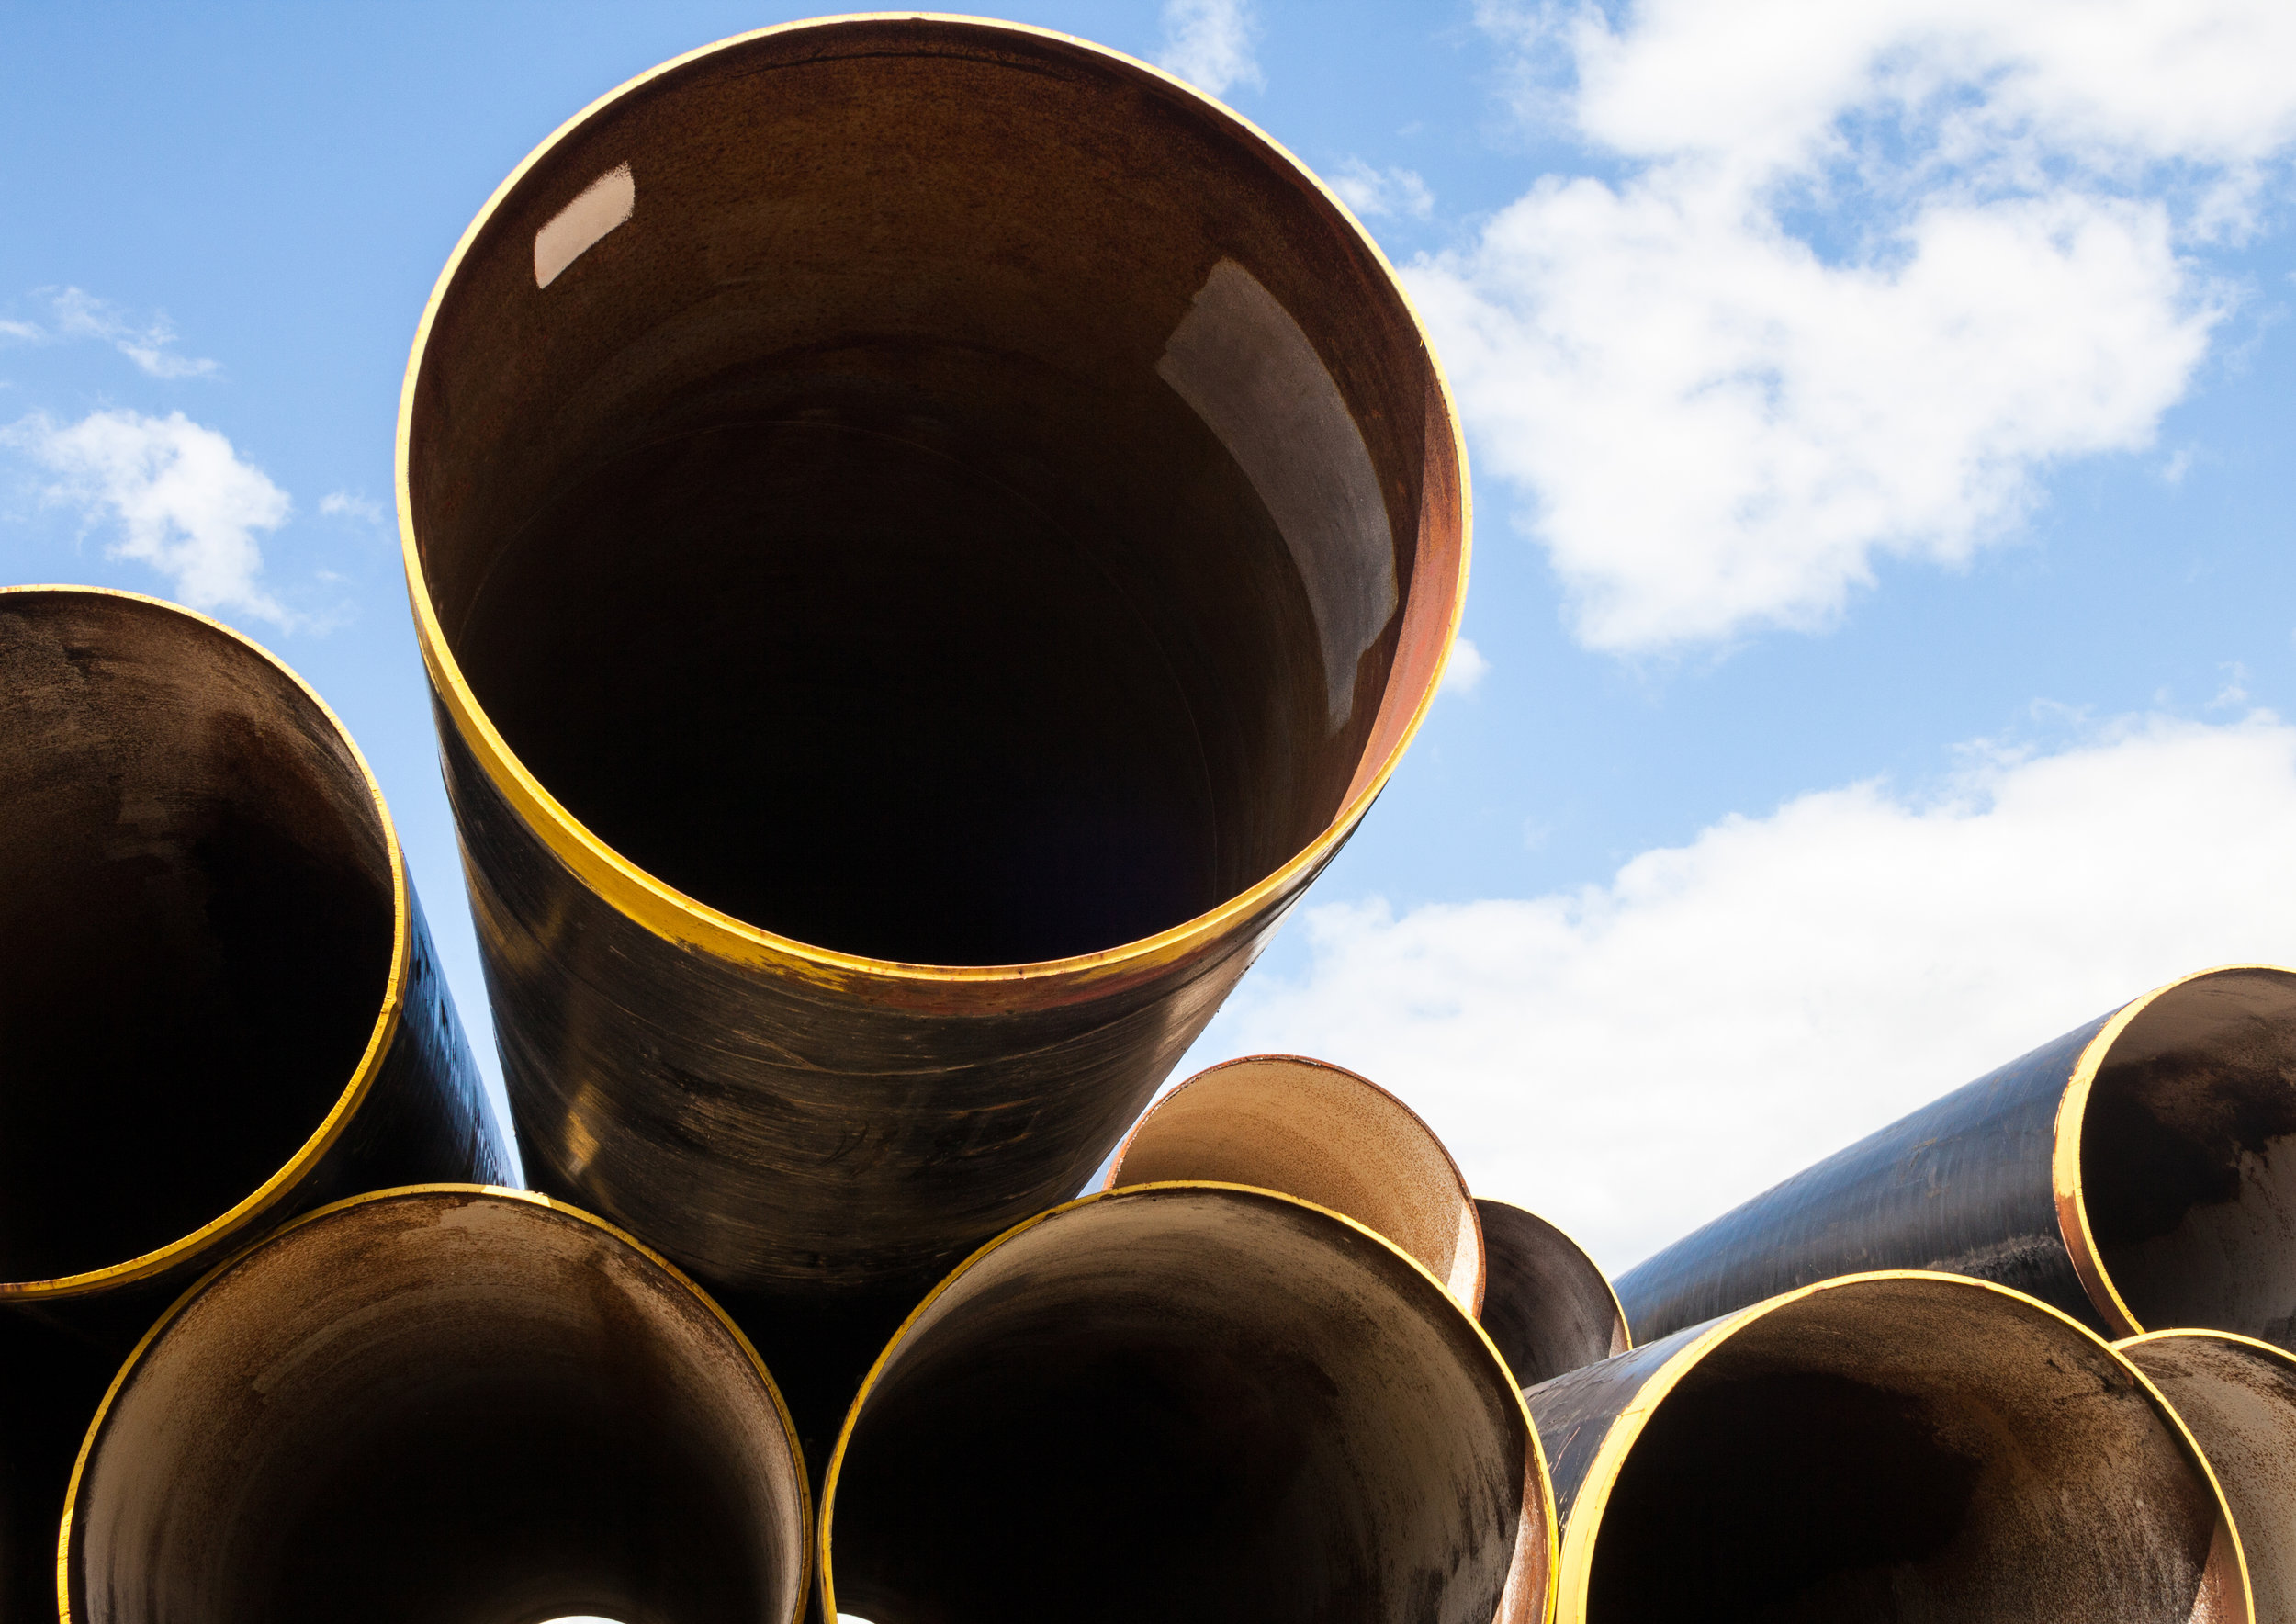 Metal-pipes-893714608_5011x3544.jpeg